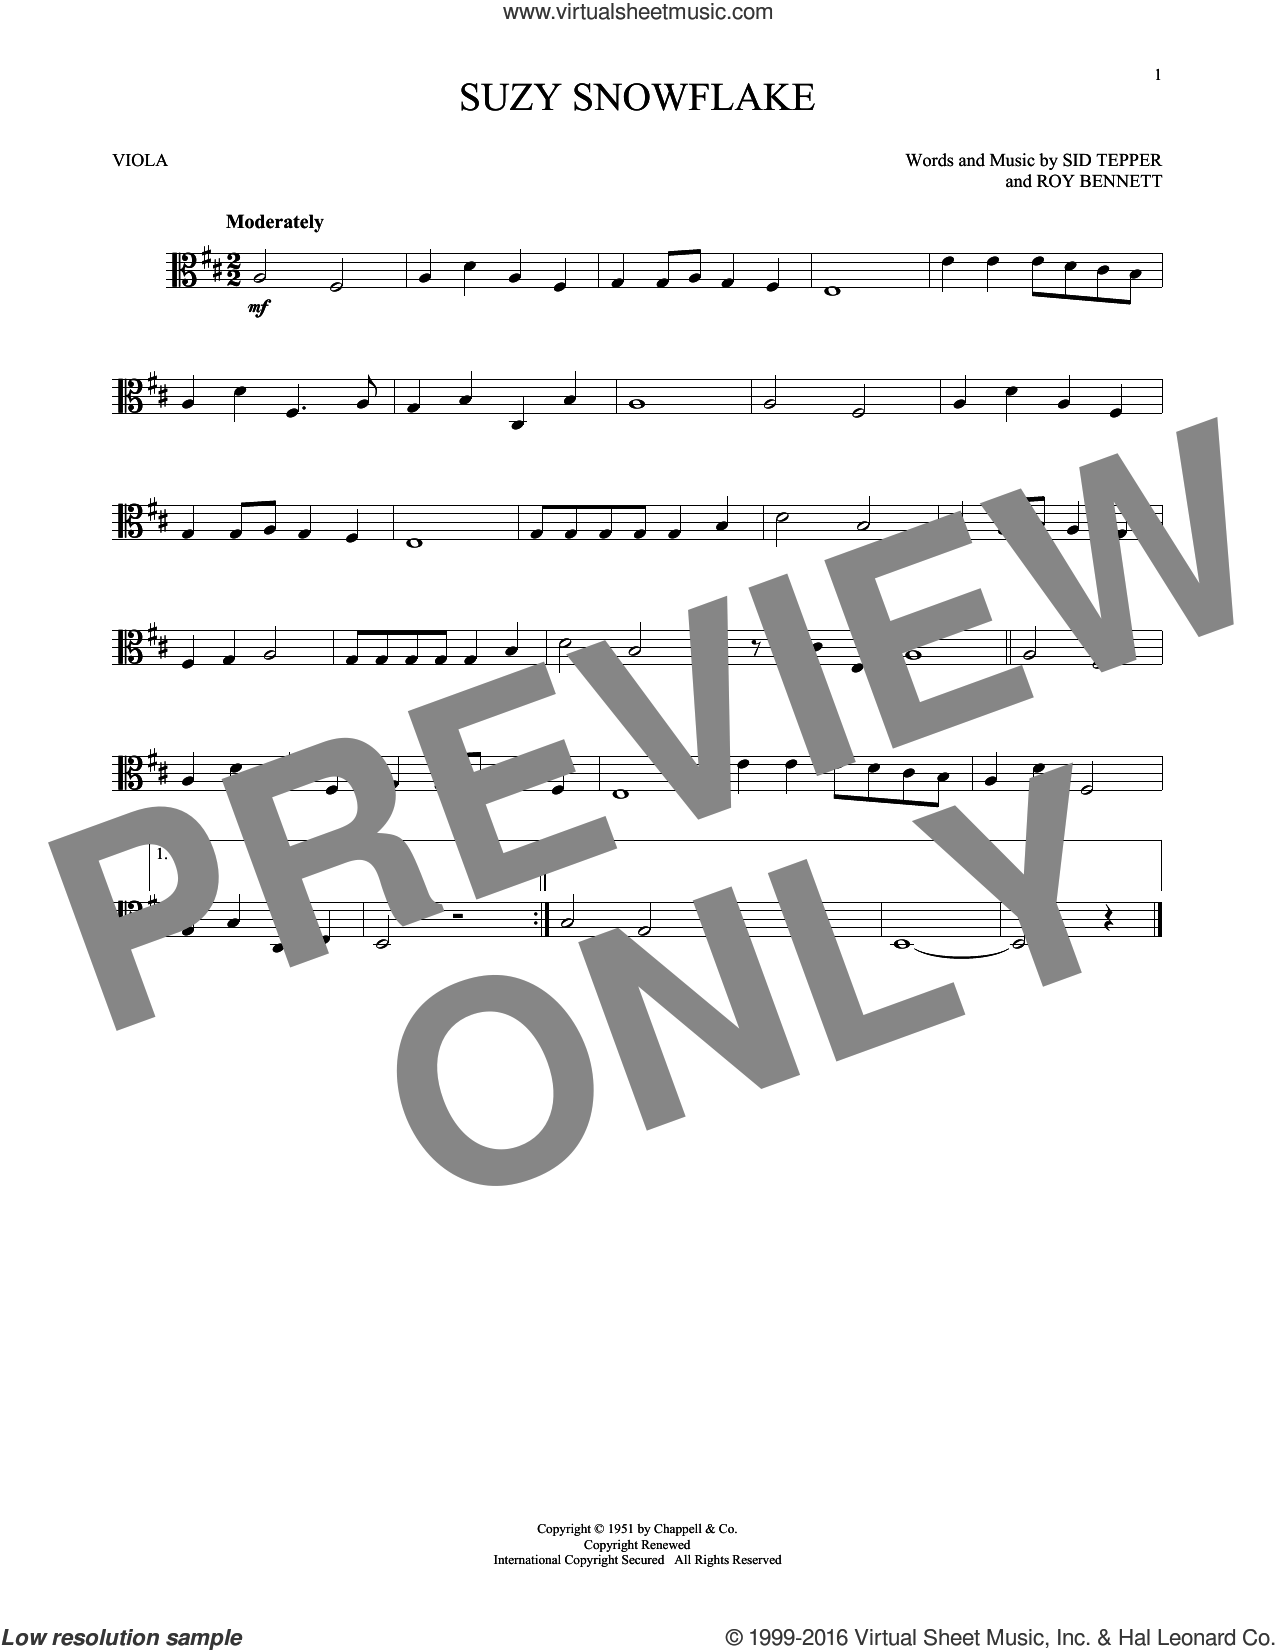 Suzy Snowflake sheet music for viola solo by Roy Bennett, Sid Tepper and Sid Tepper and Roy Bennett, intermediate skill level